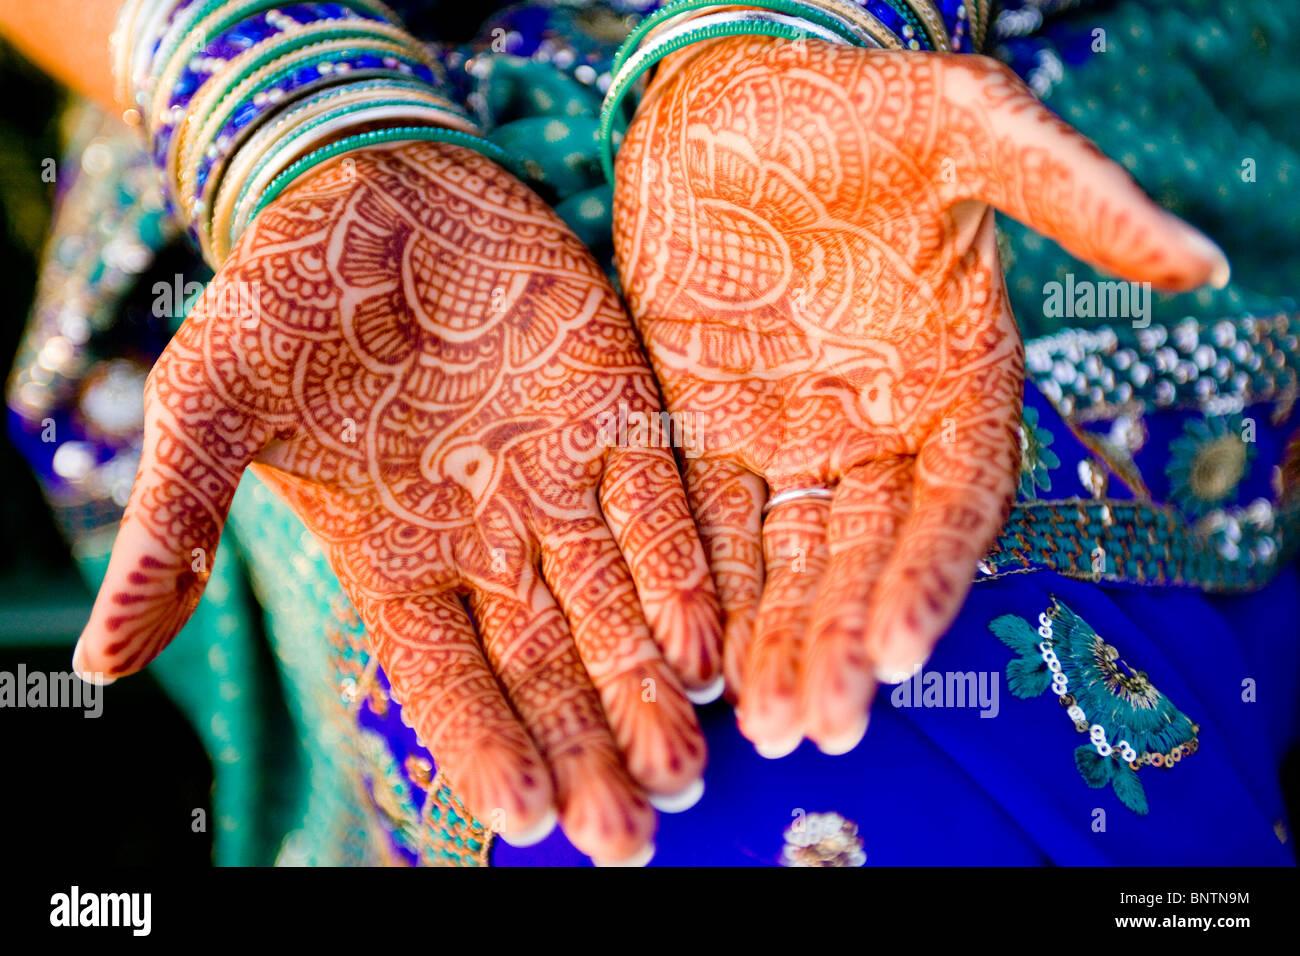 Mehndi Hand Decoration Games : Mehndi skin decoration with henna on indian bride s